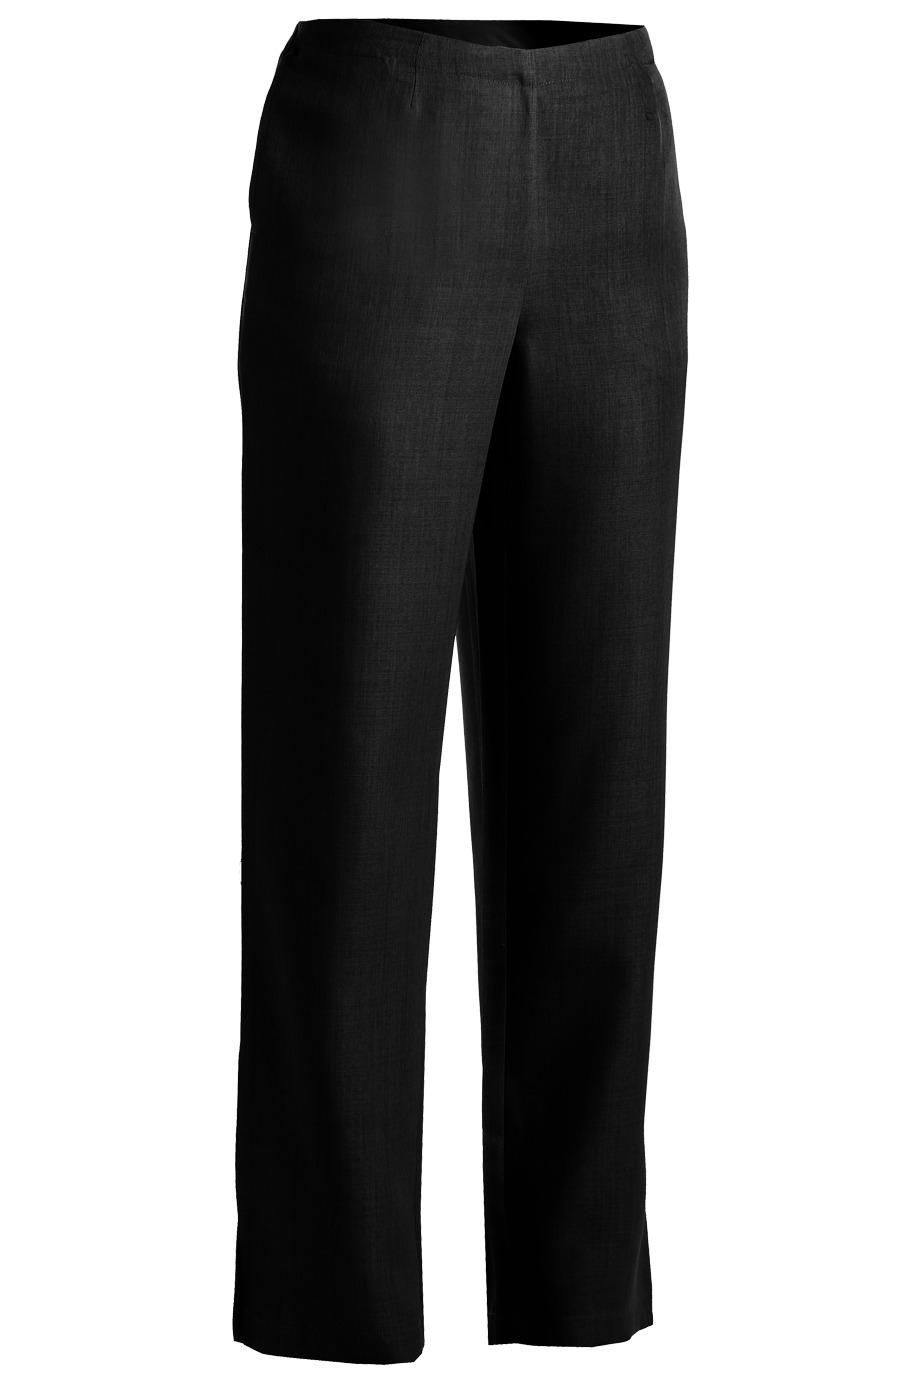 Edwards Garment 8891 - Premier Pull On Pant